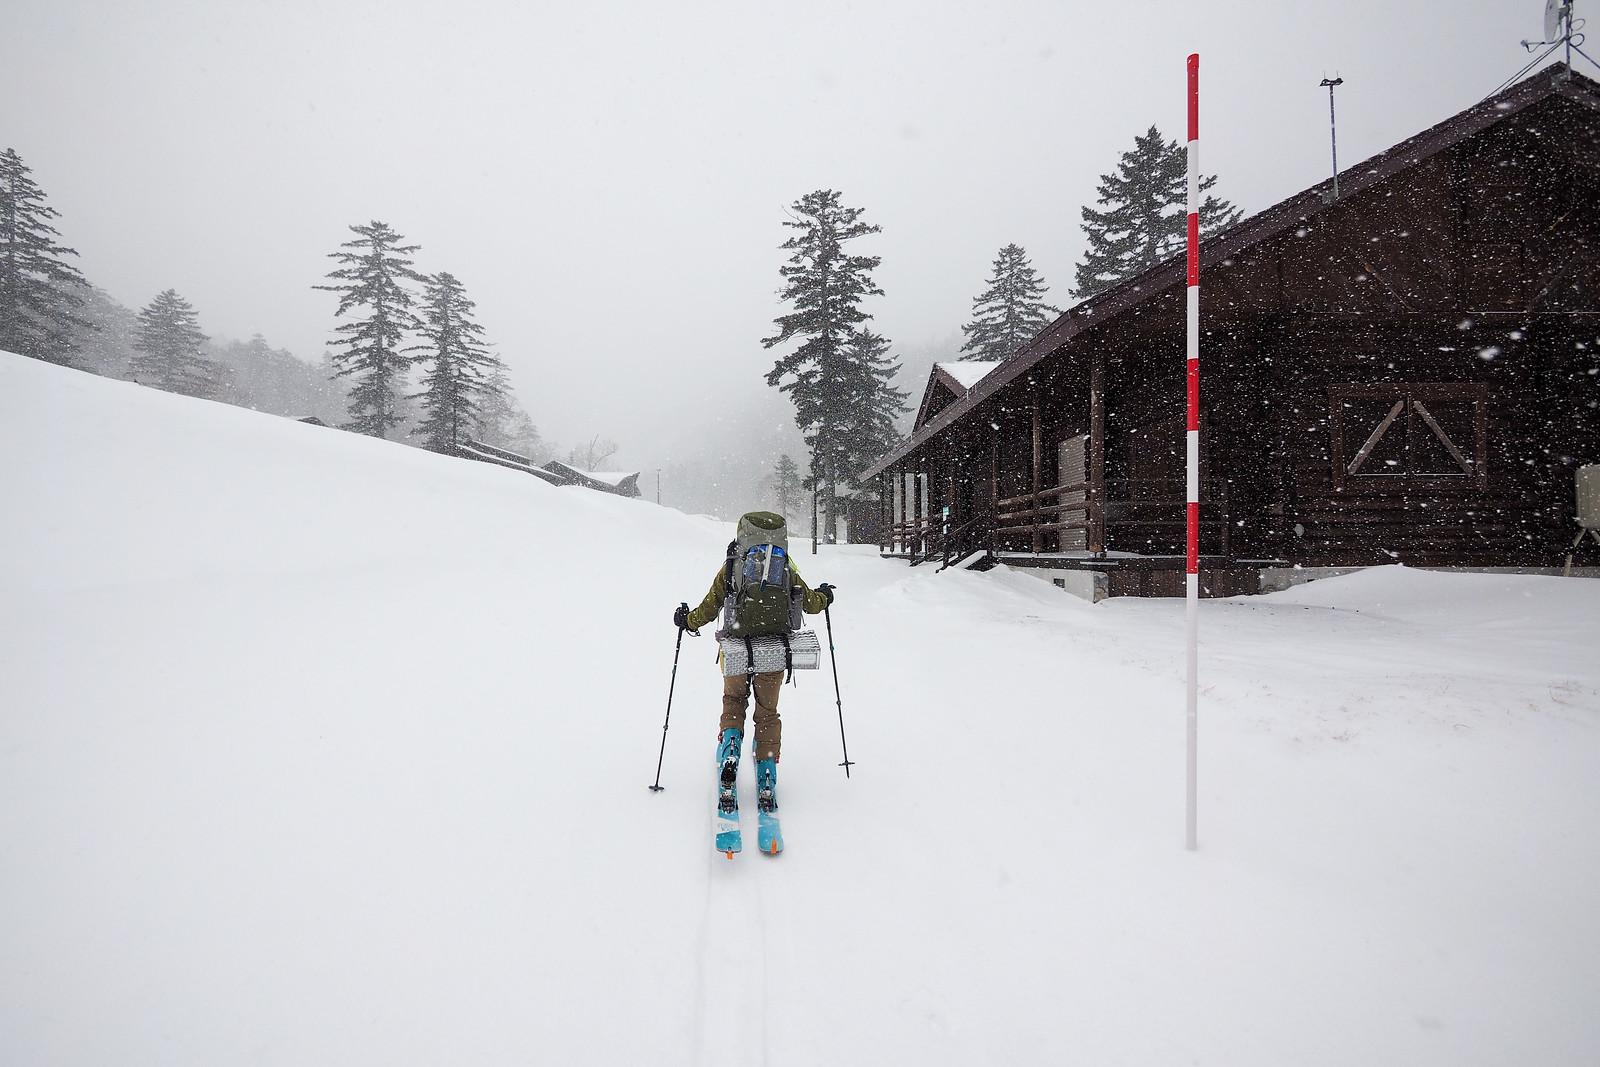 Mt. Mokoto Hut Overnight Ski Tour (Lake Kussharo, Hokkaido, Japan)